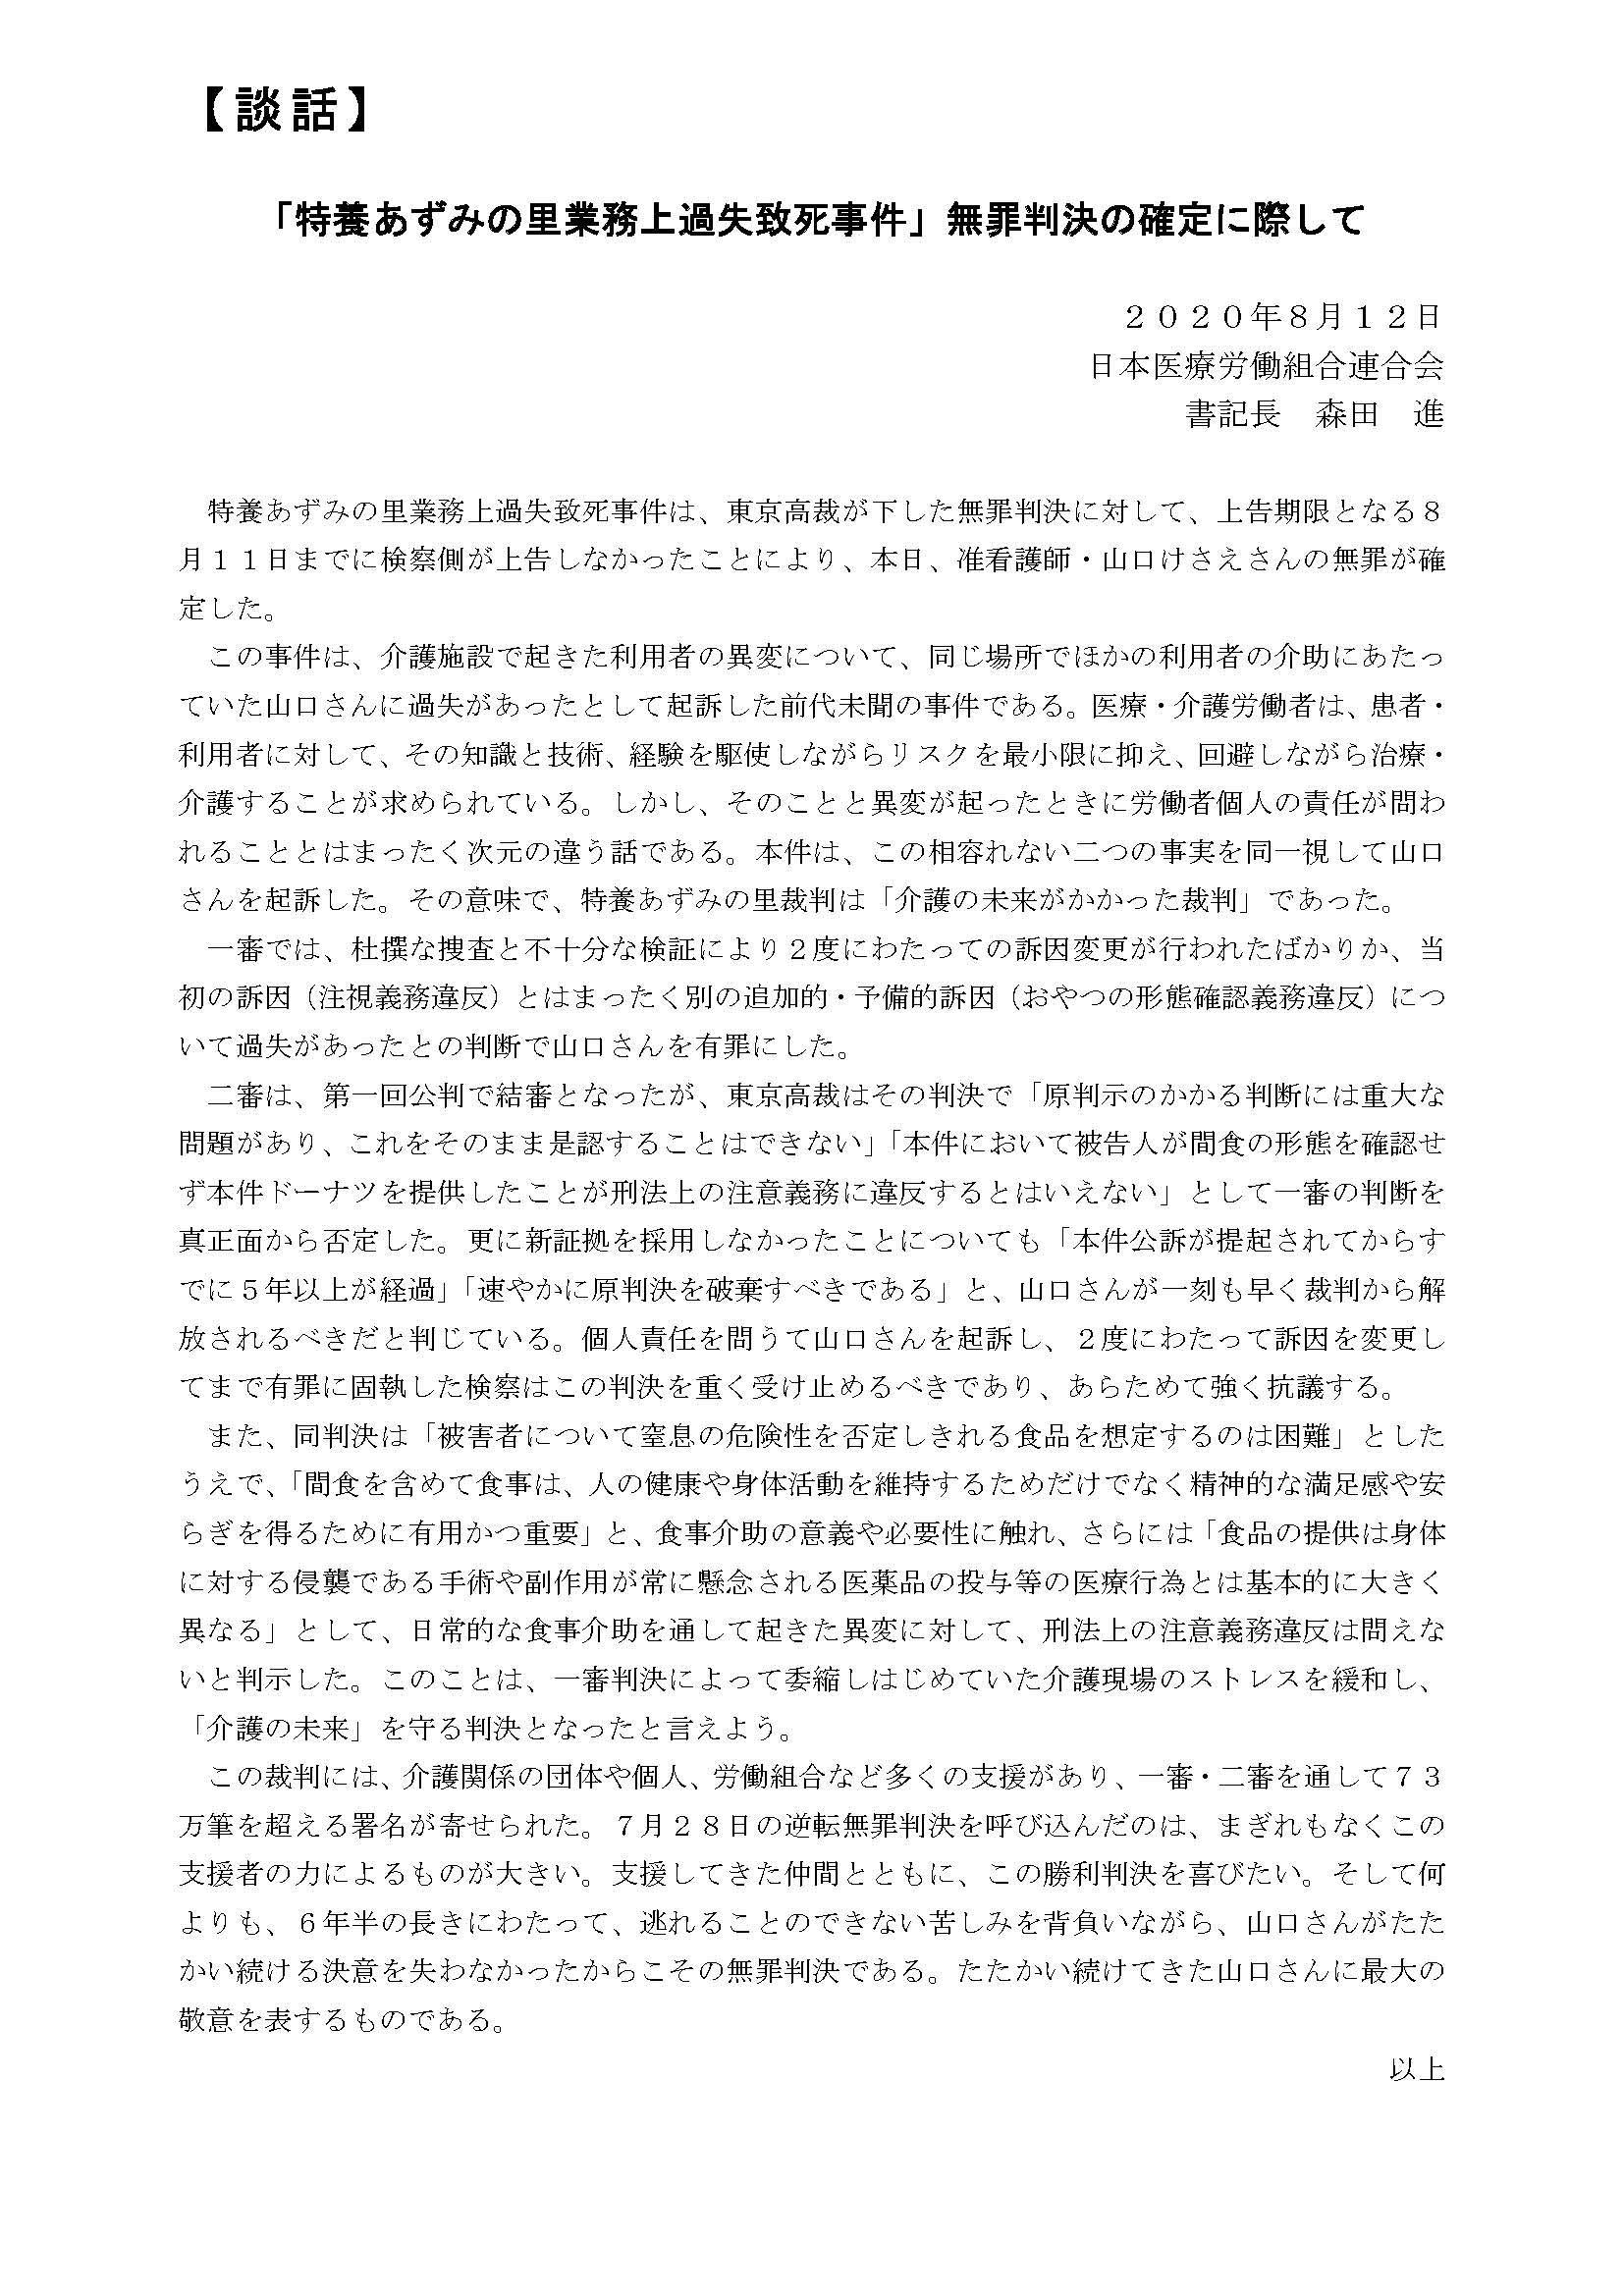 http://irouren.or.jp/news/3ad02a65aa2819658169ae508e3f342b71e8257c.jpg